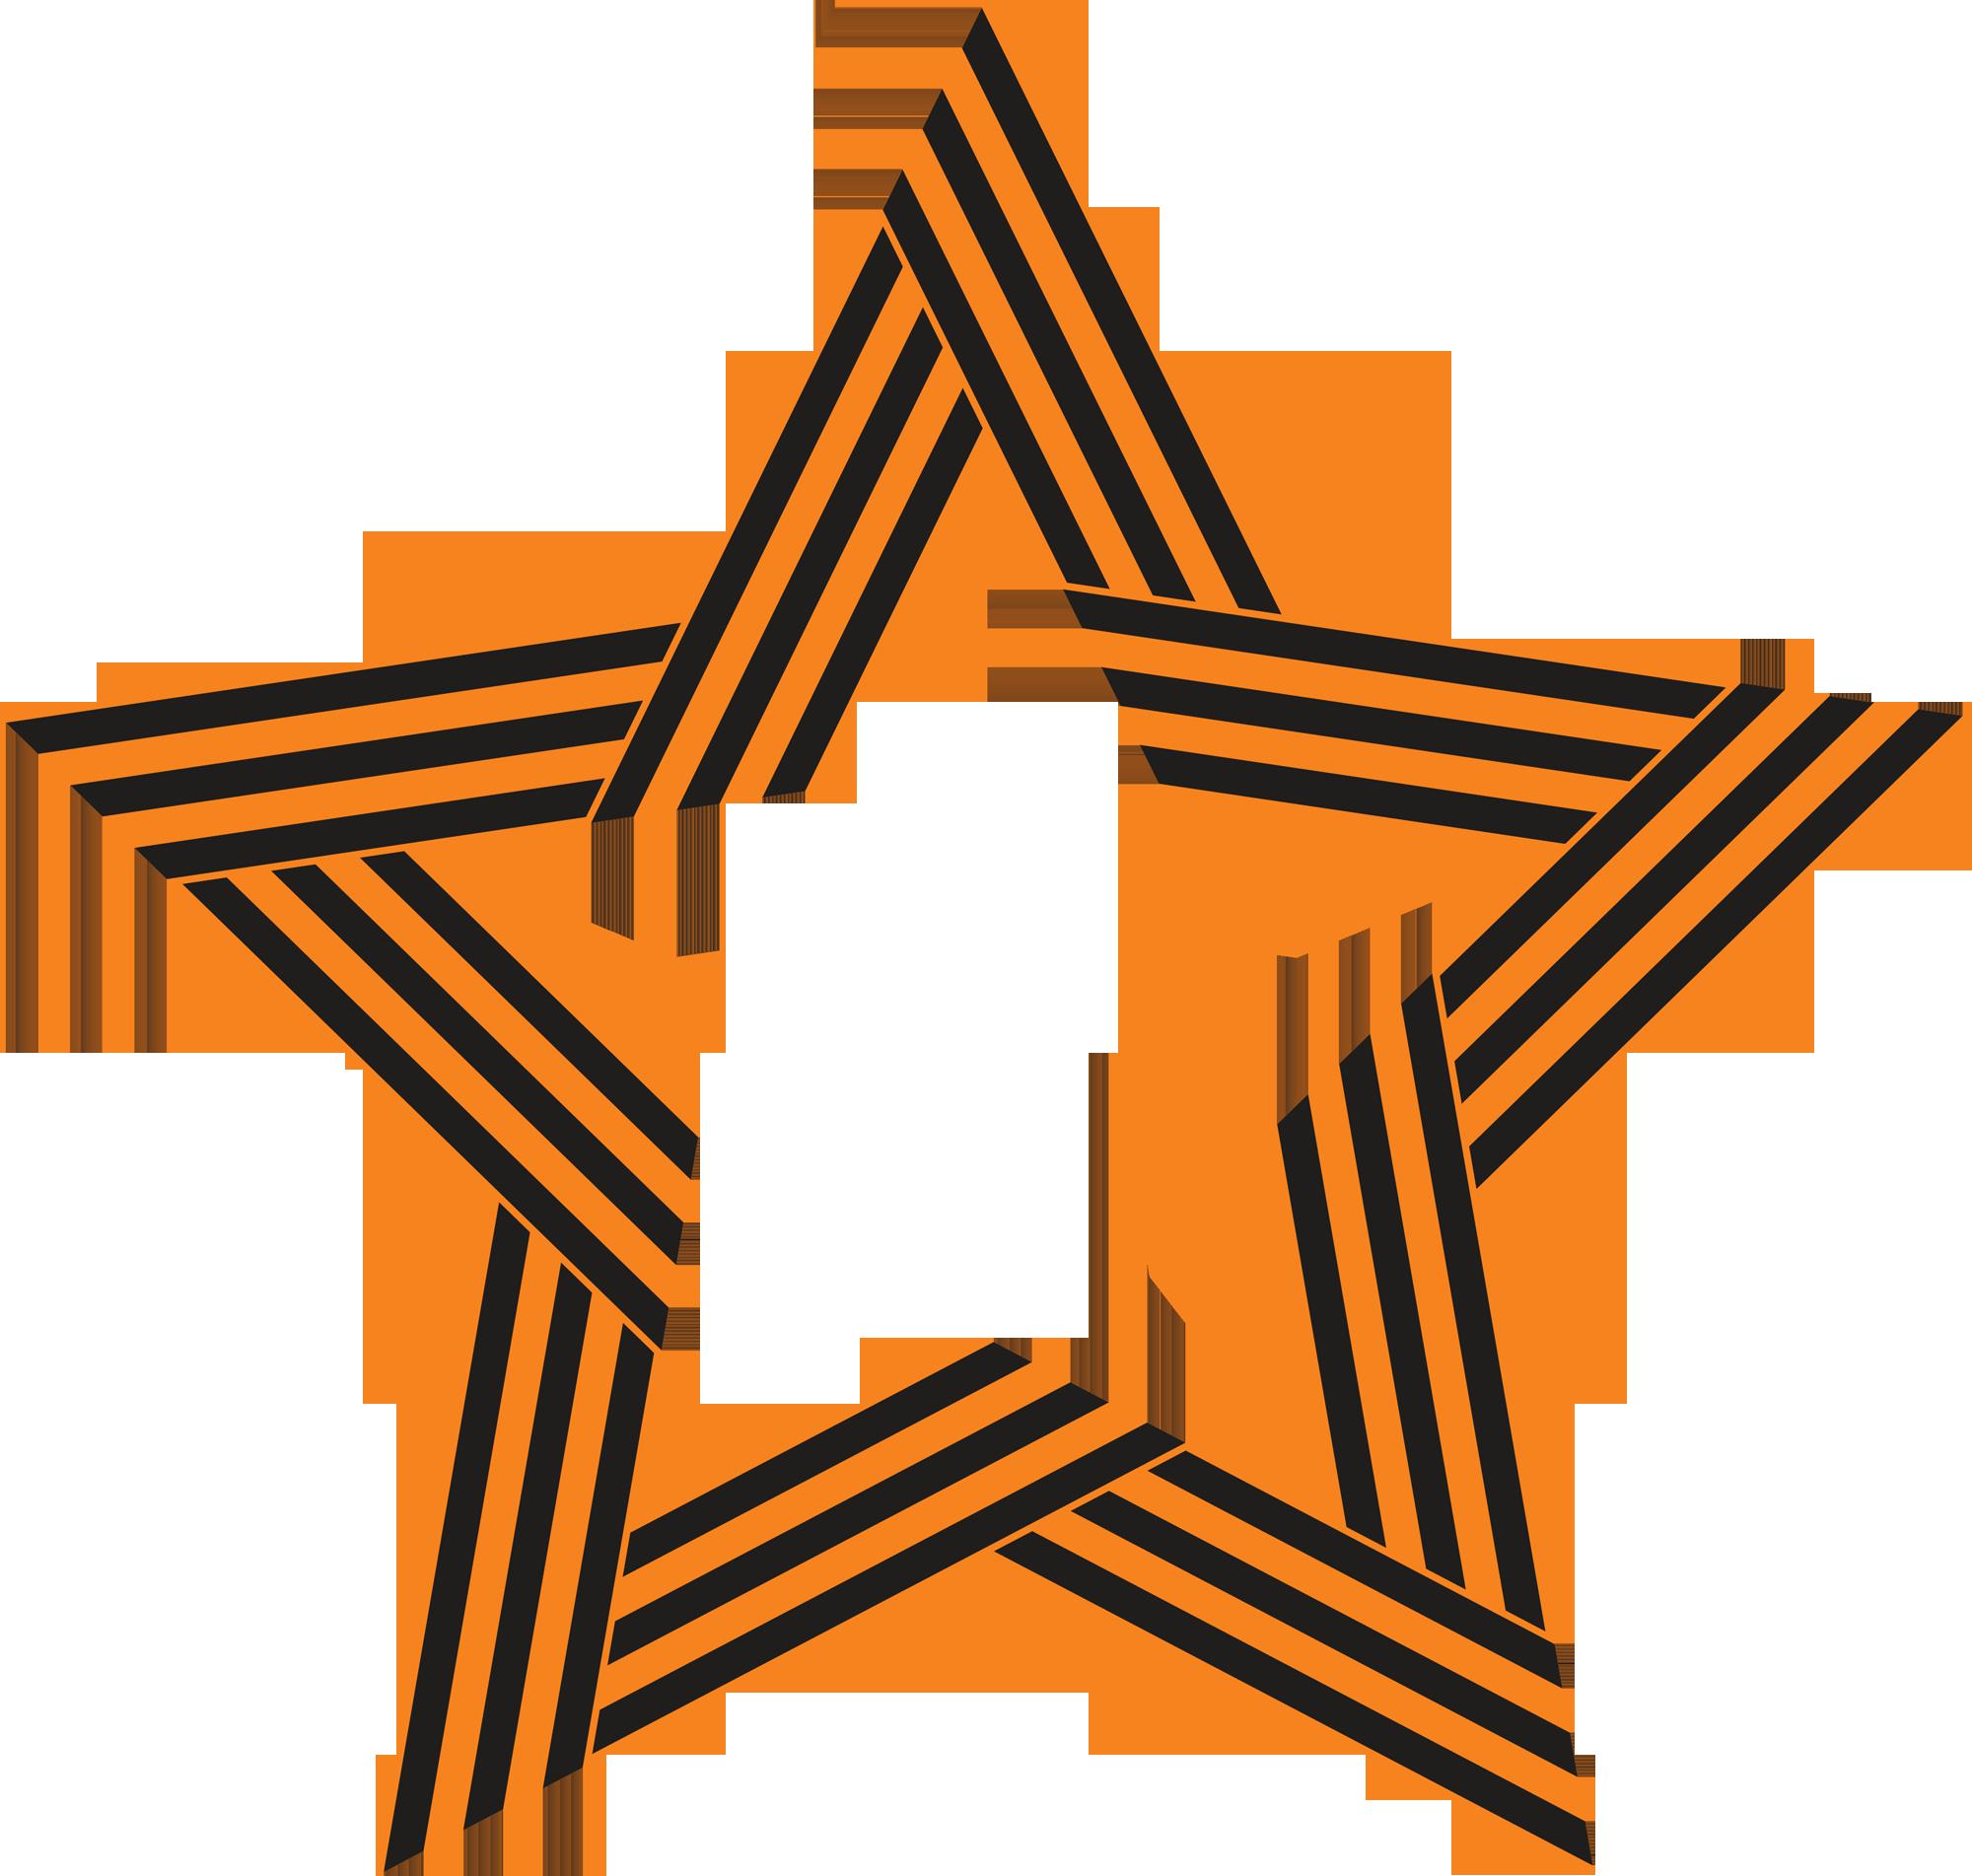 D:\Картинки\Медали и т.д\russian_war-patriotic_symbols\star_11.png